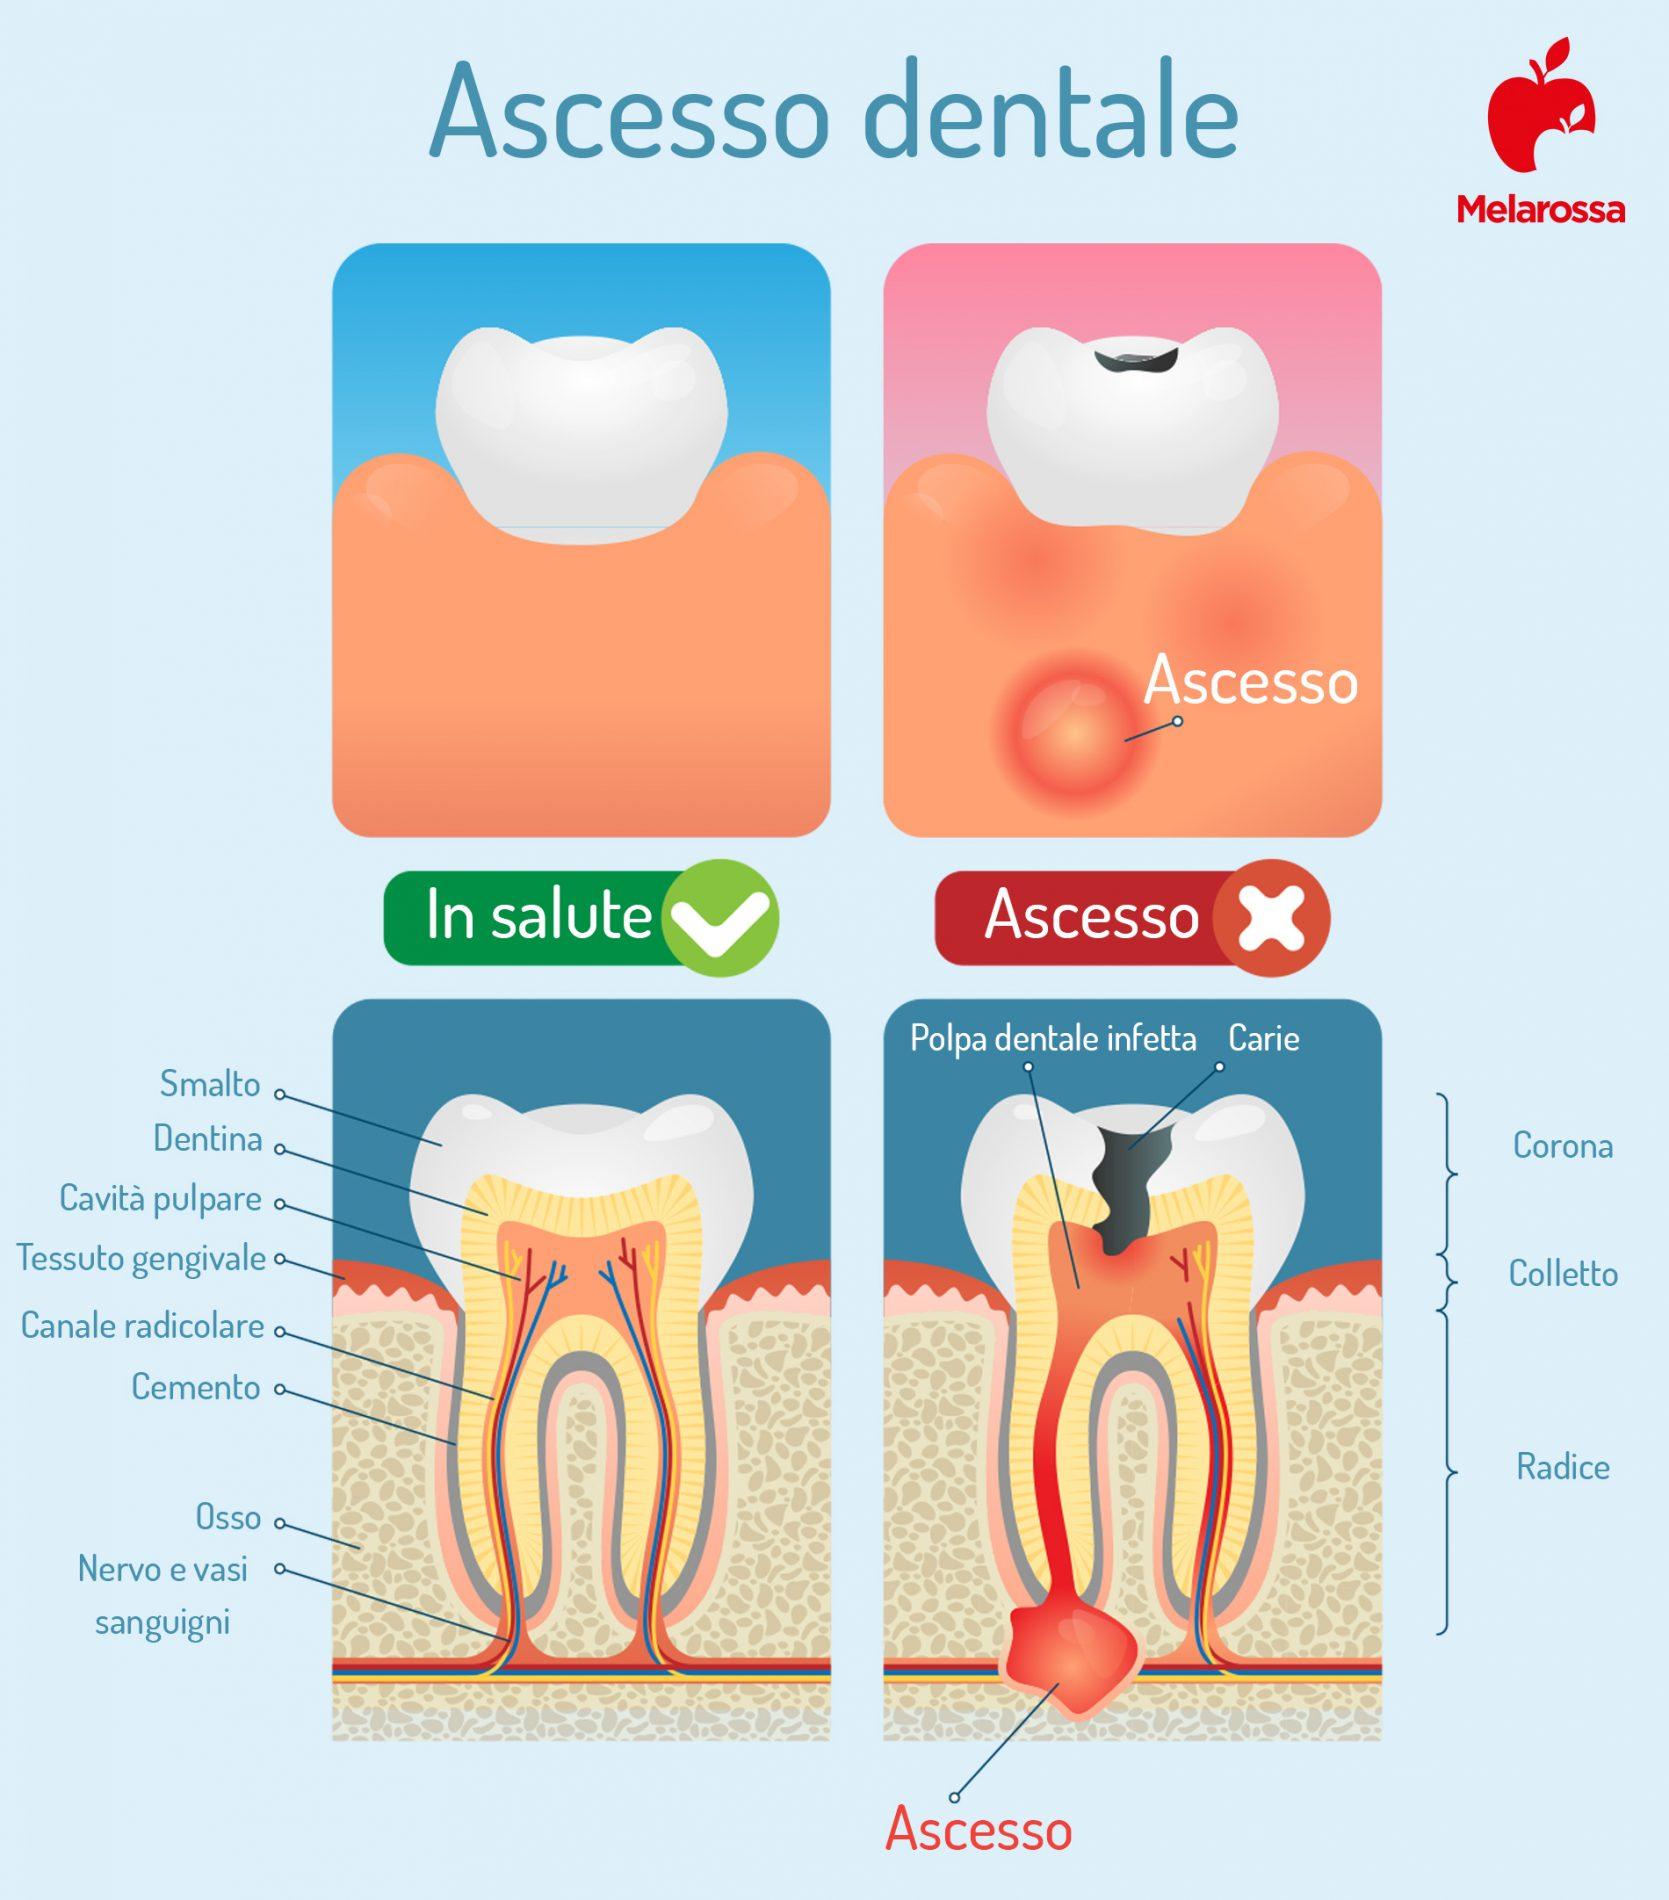 ascesso dentale, sintomi